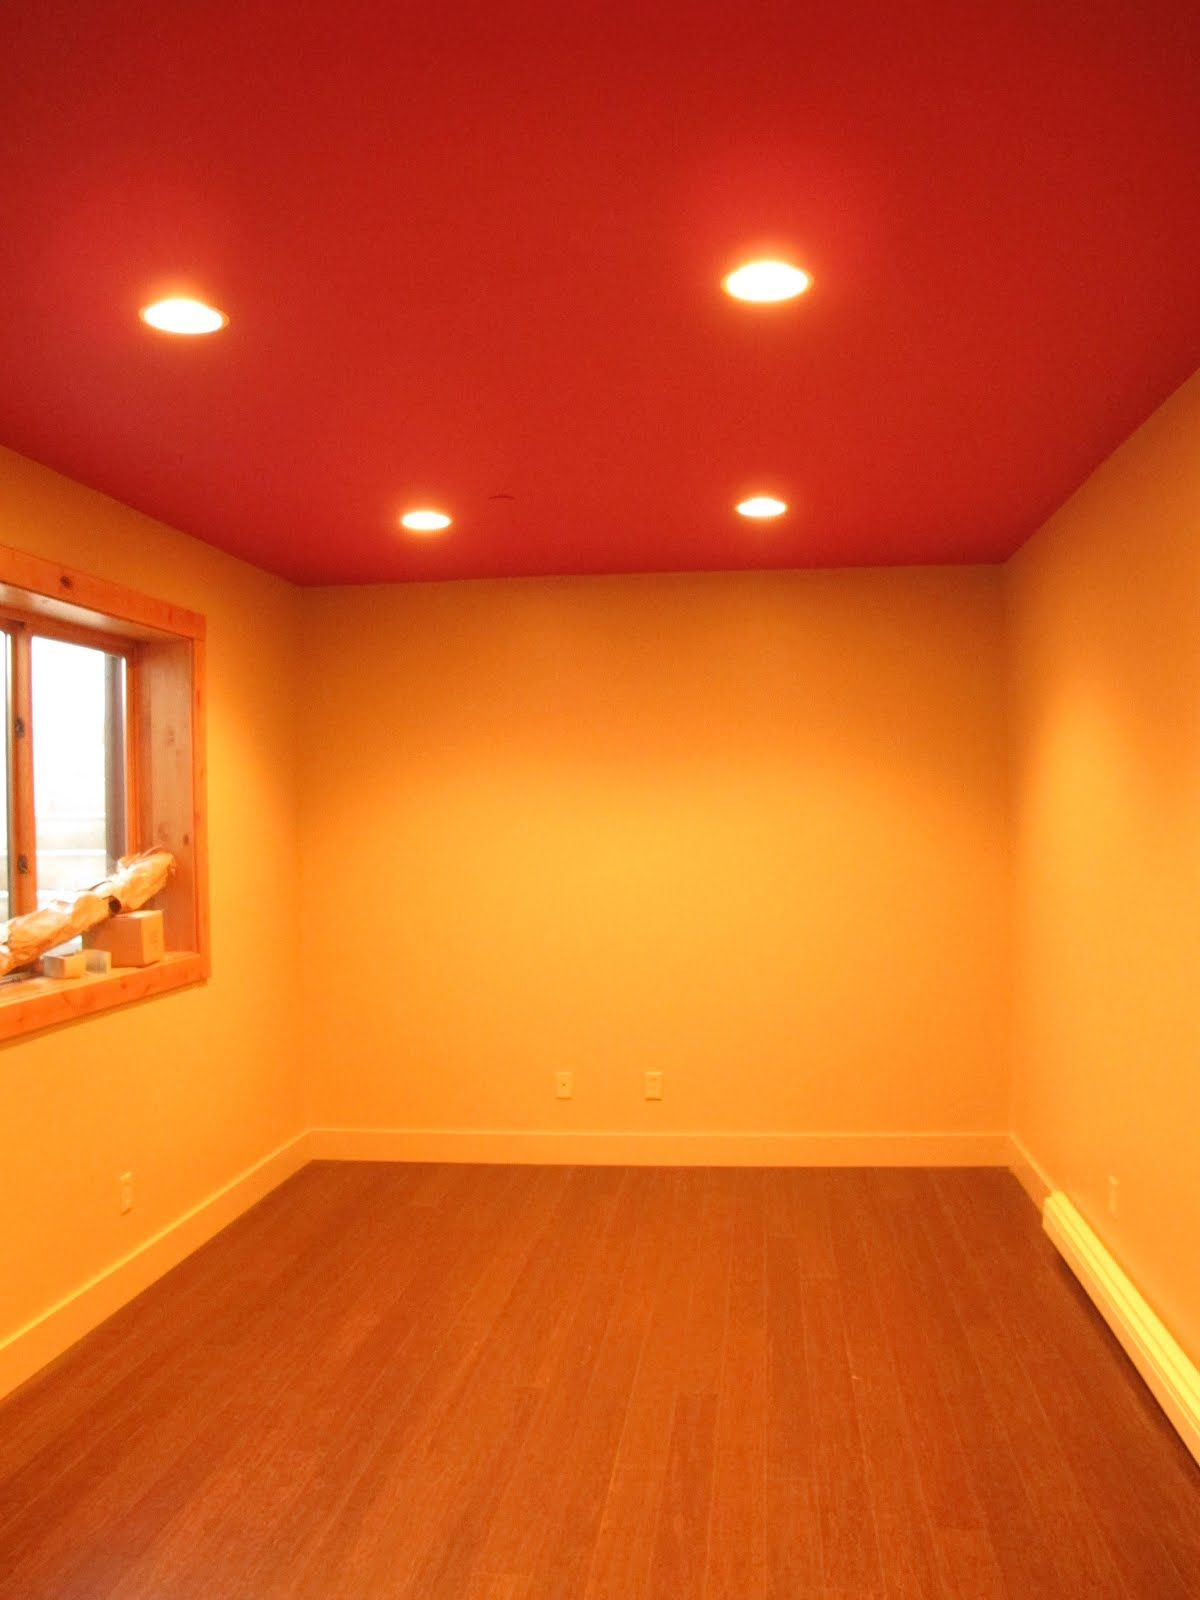 at home yoga studio | yoga ~ my highest light and love | Pinterest ...